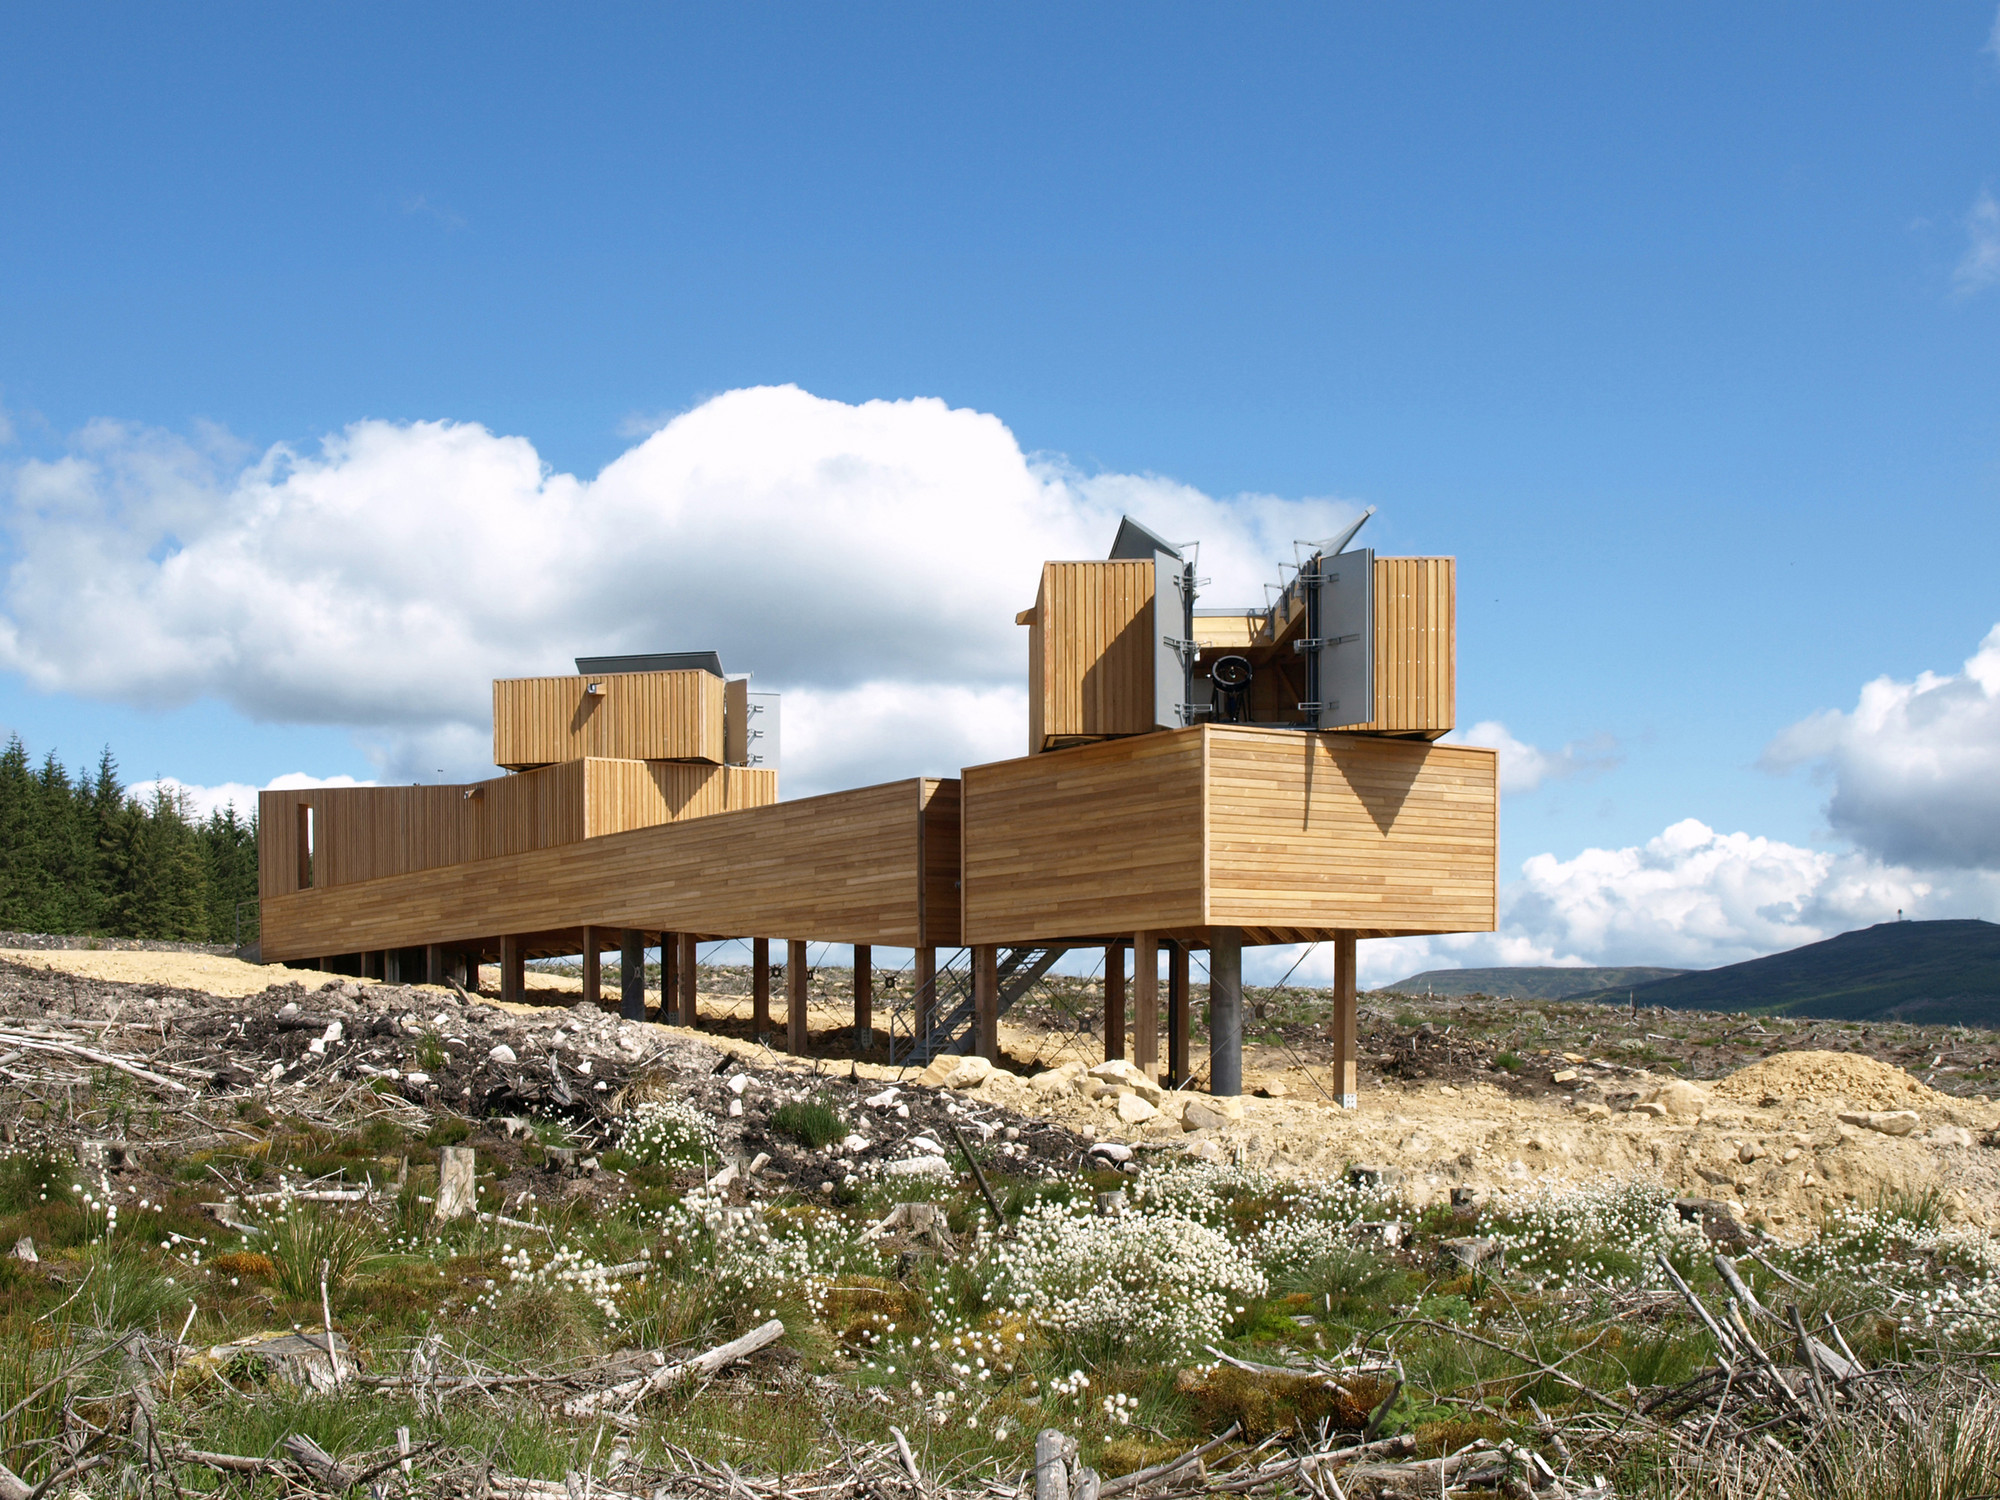 Kielder Observatory / Charles Barclay Architects, Courtesy of Charles Barclay Architects